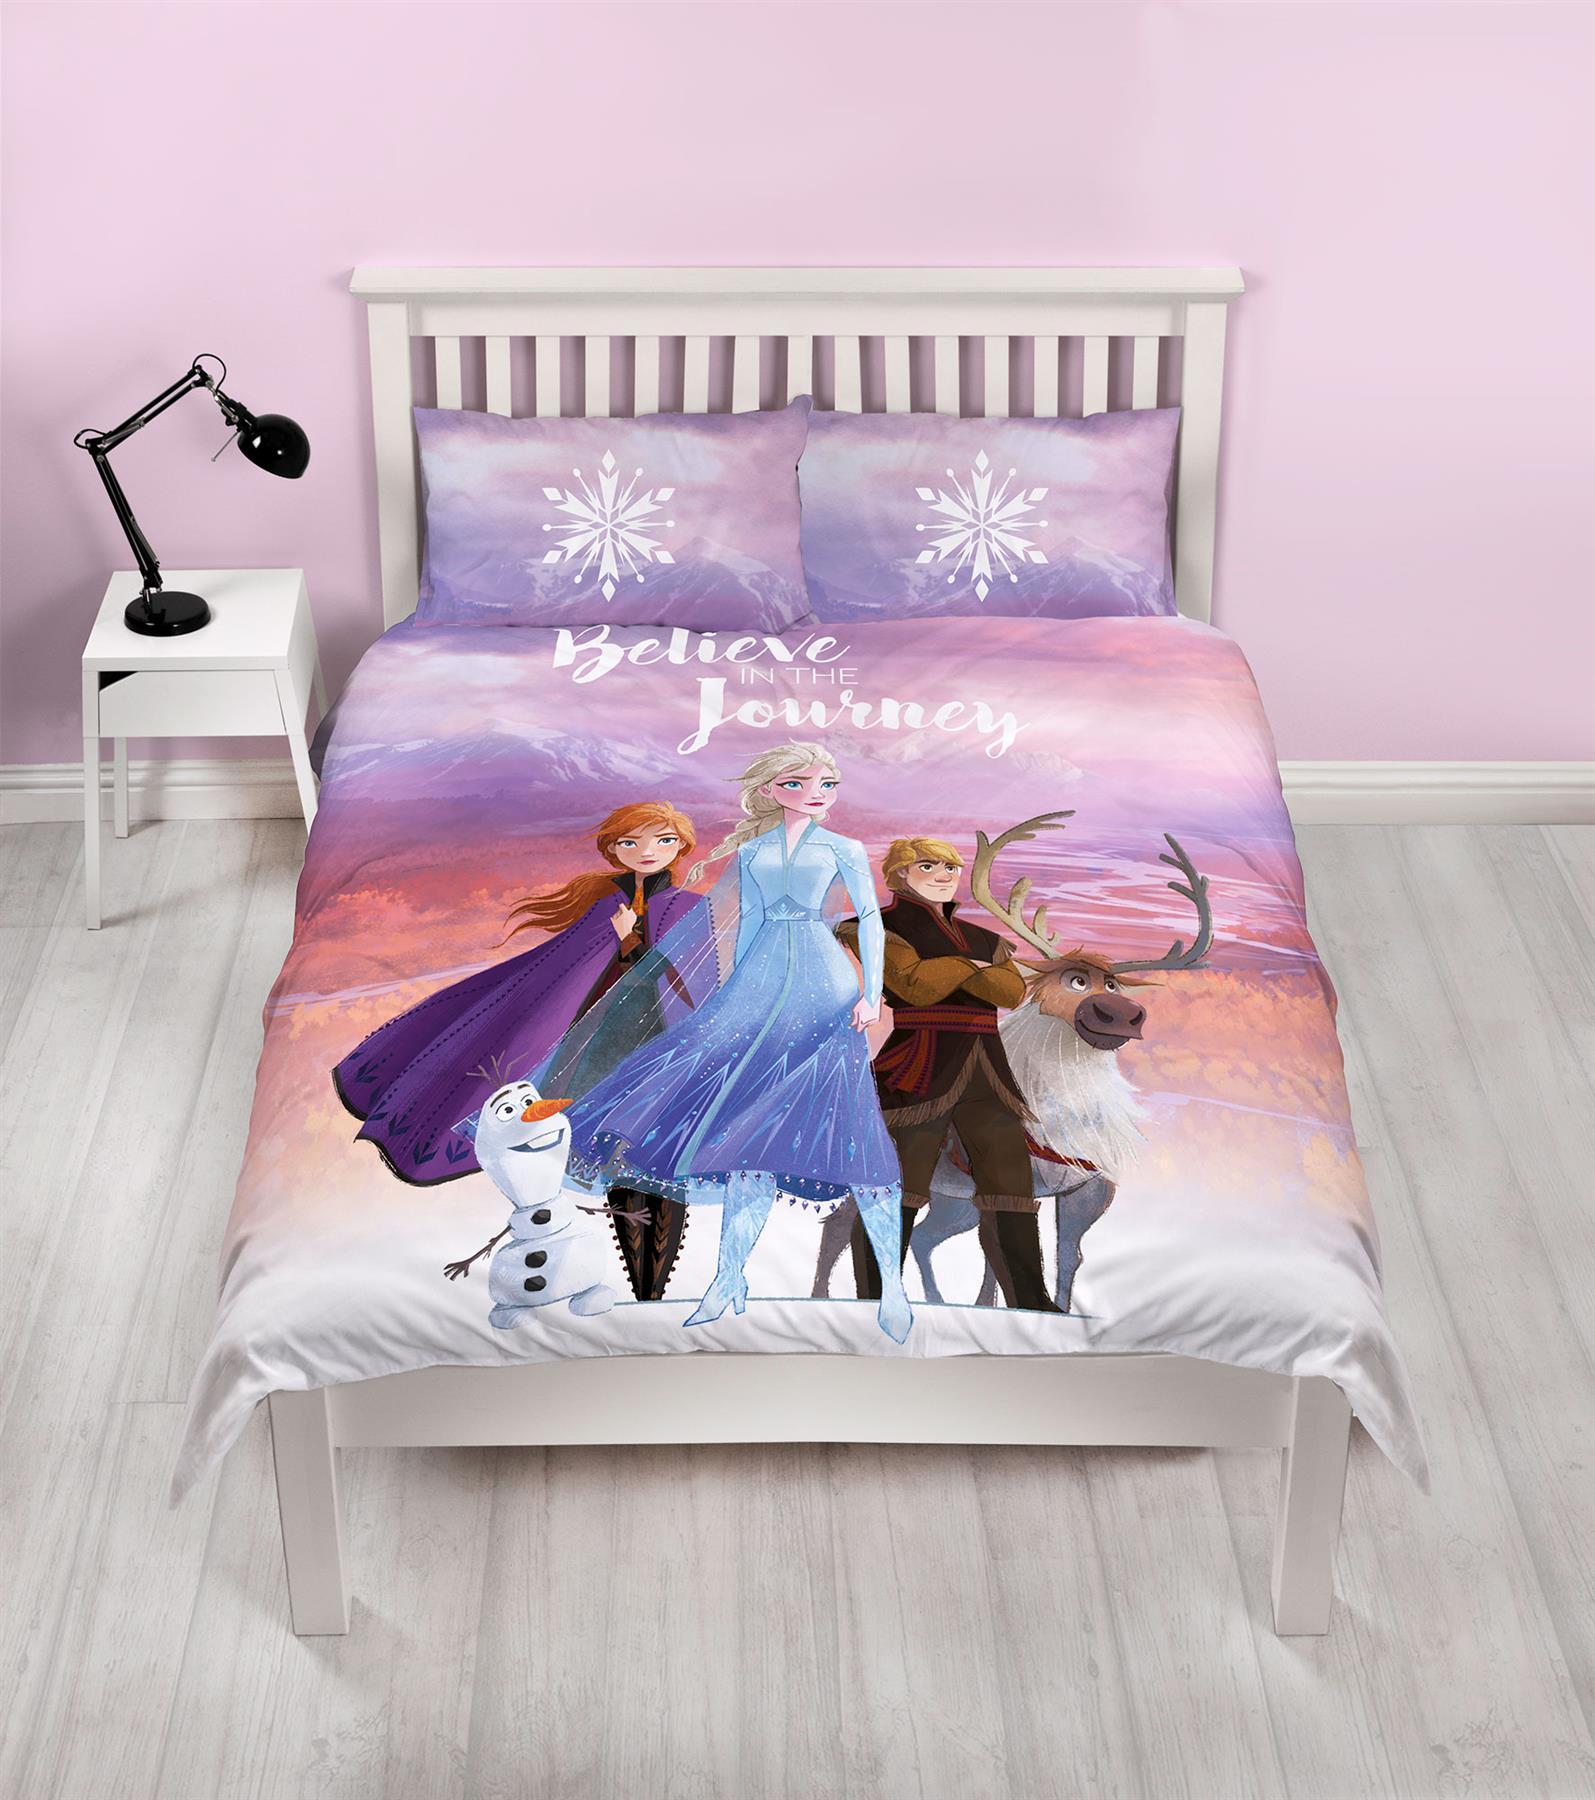 Official-Frozen-2-Duvet-Covers-Single-Double-Reversible-Bedding-Elsa-Anna-Olaf thumbnail 8